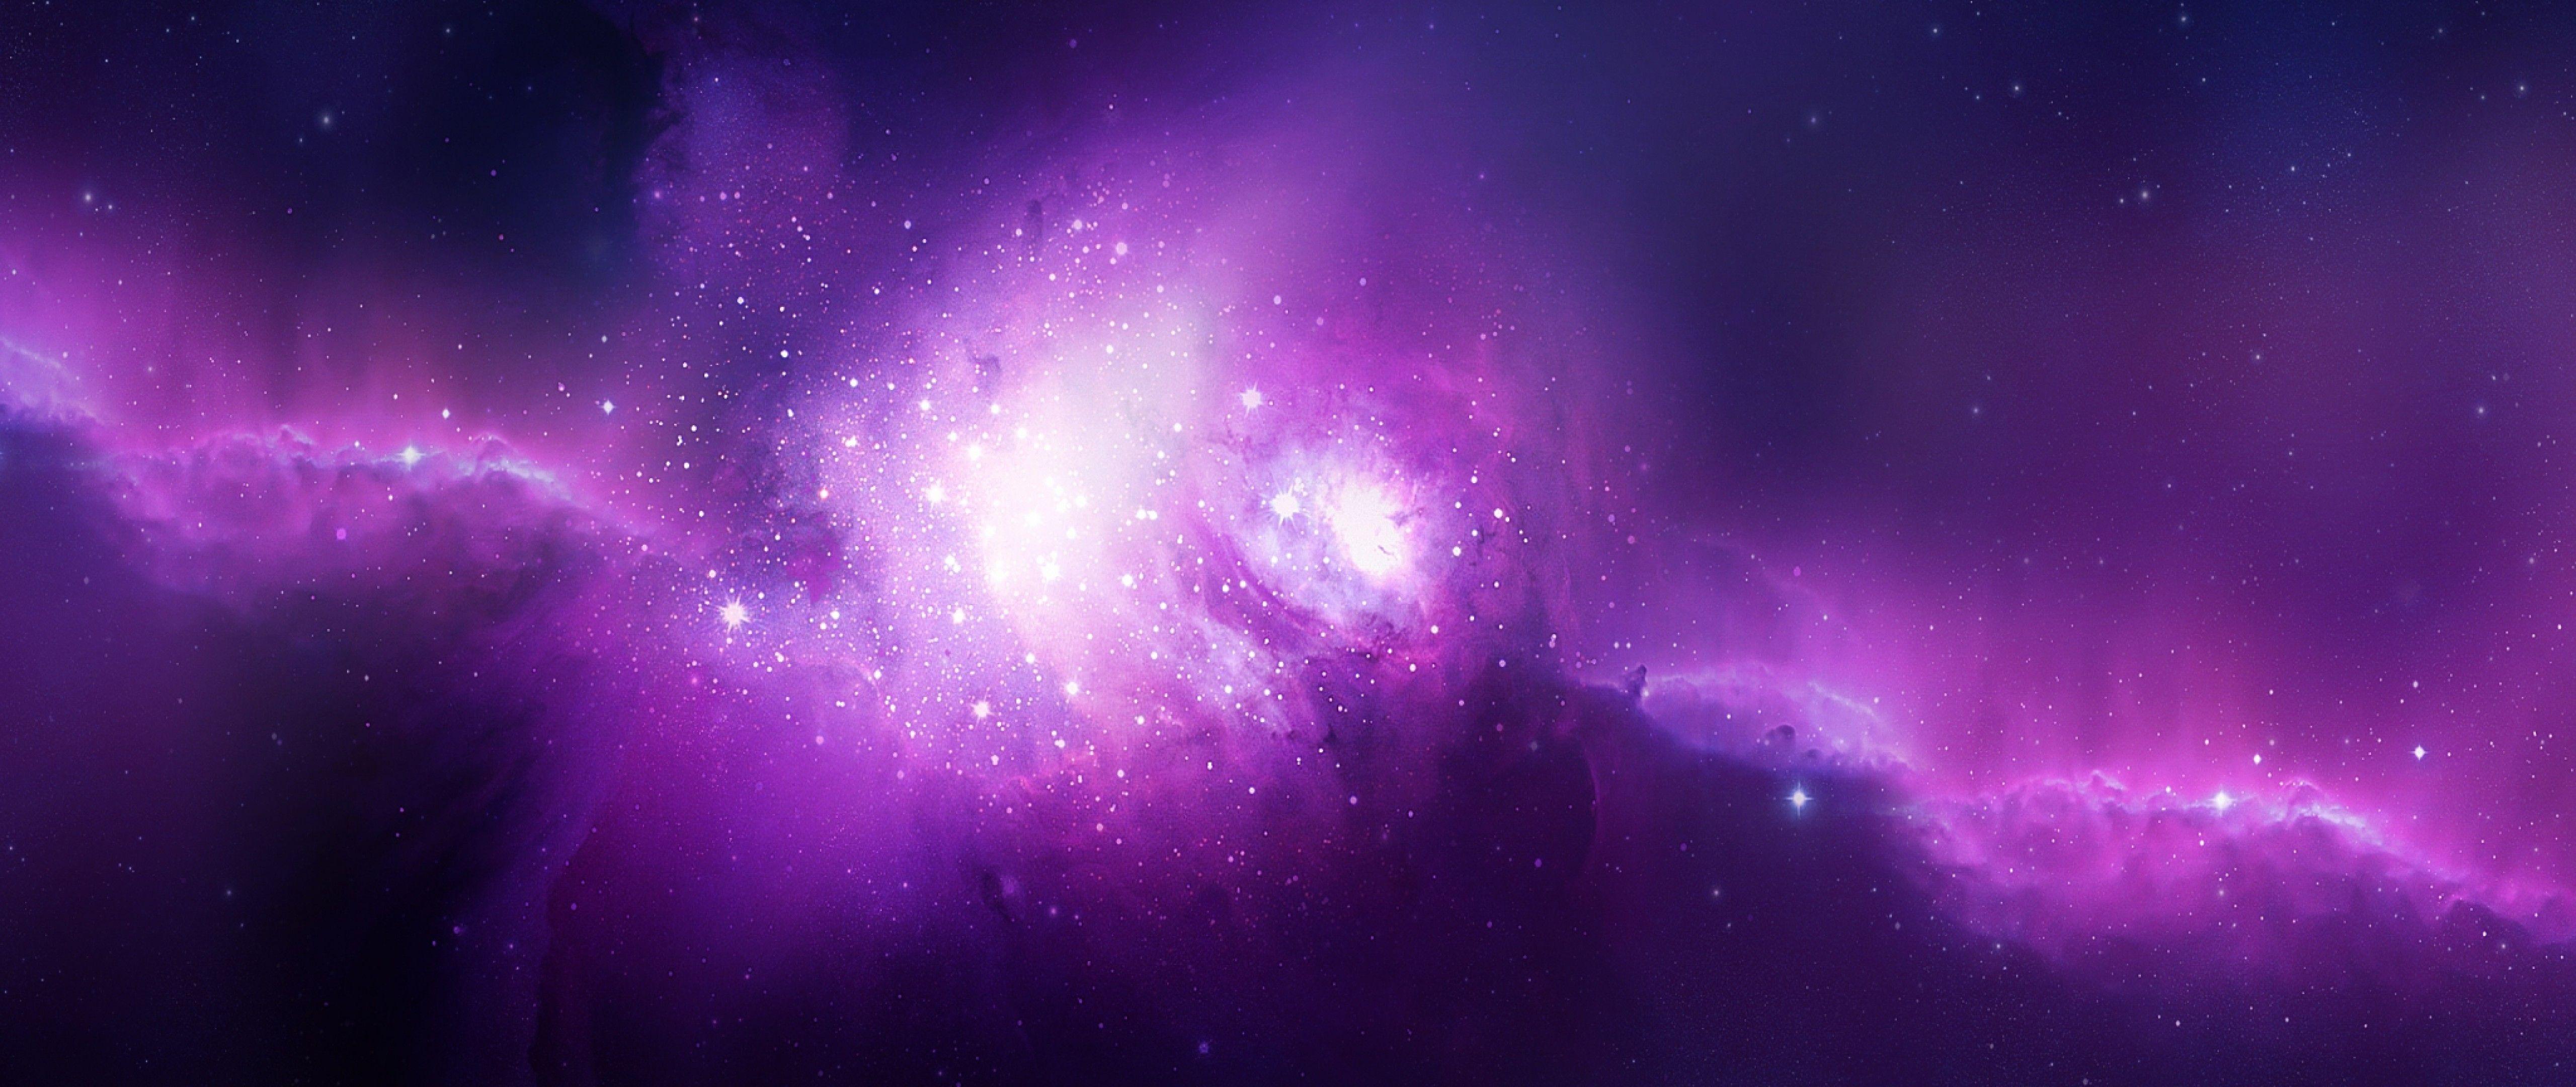 purple galaxy aesthetic - HD2558×1024